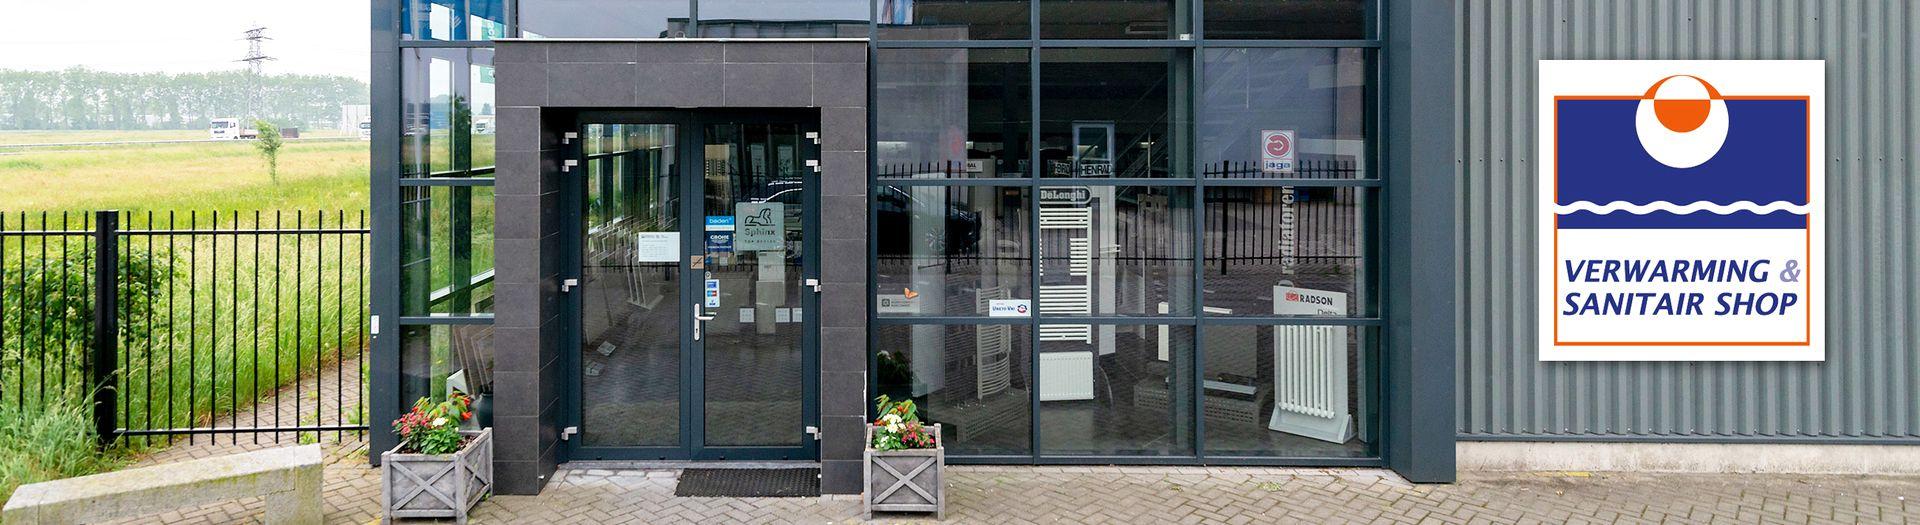 Verwarming & Sanitair Shop - Verwarming & Sanitair Shop